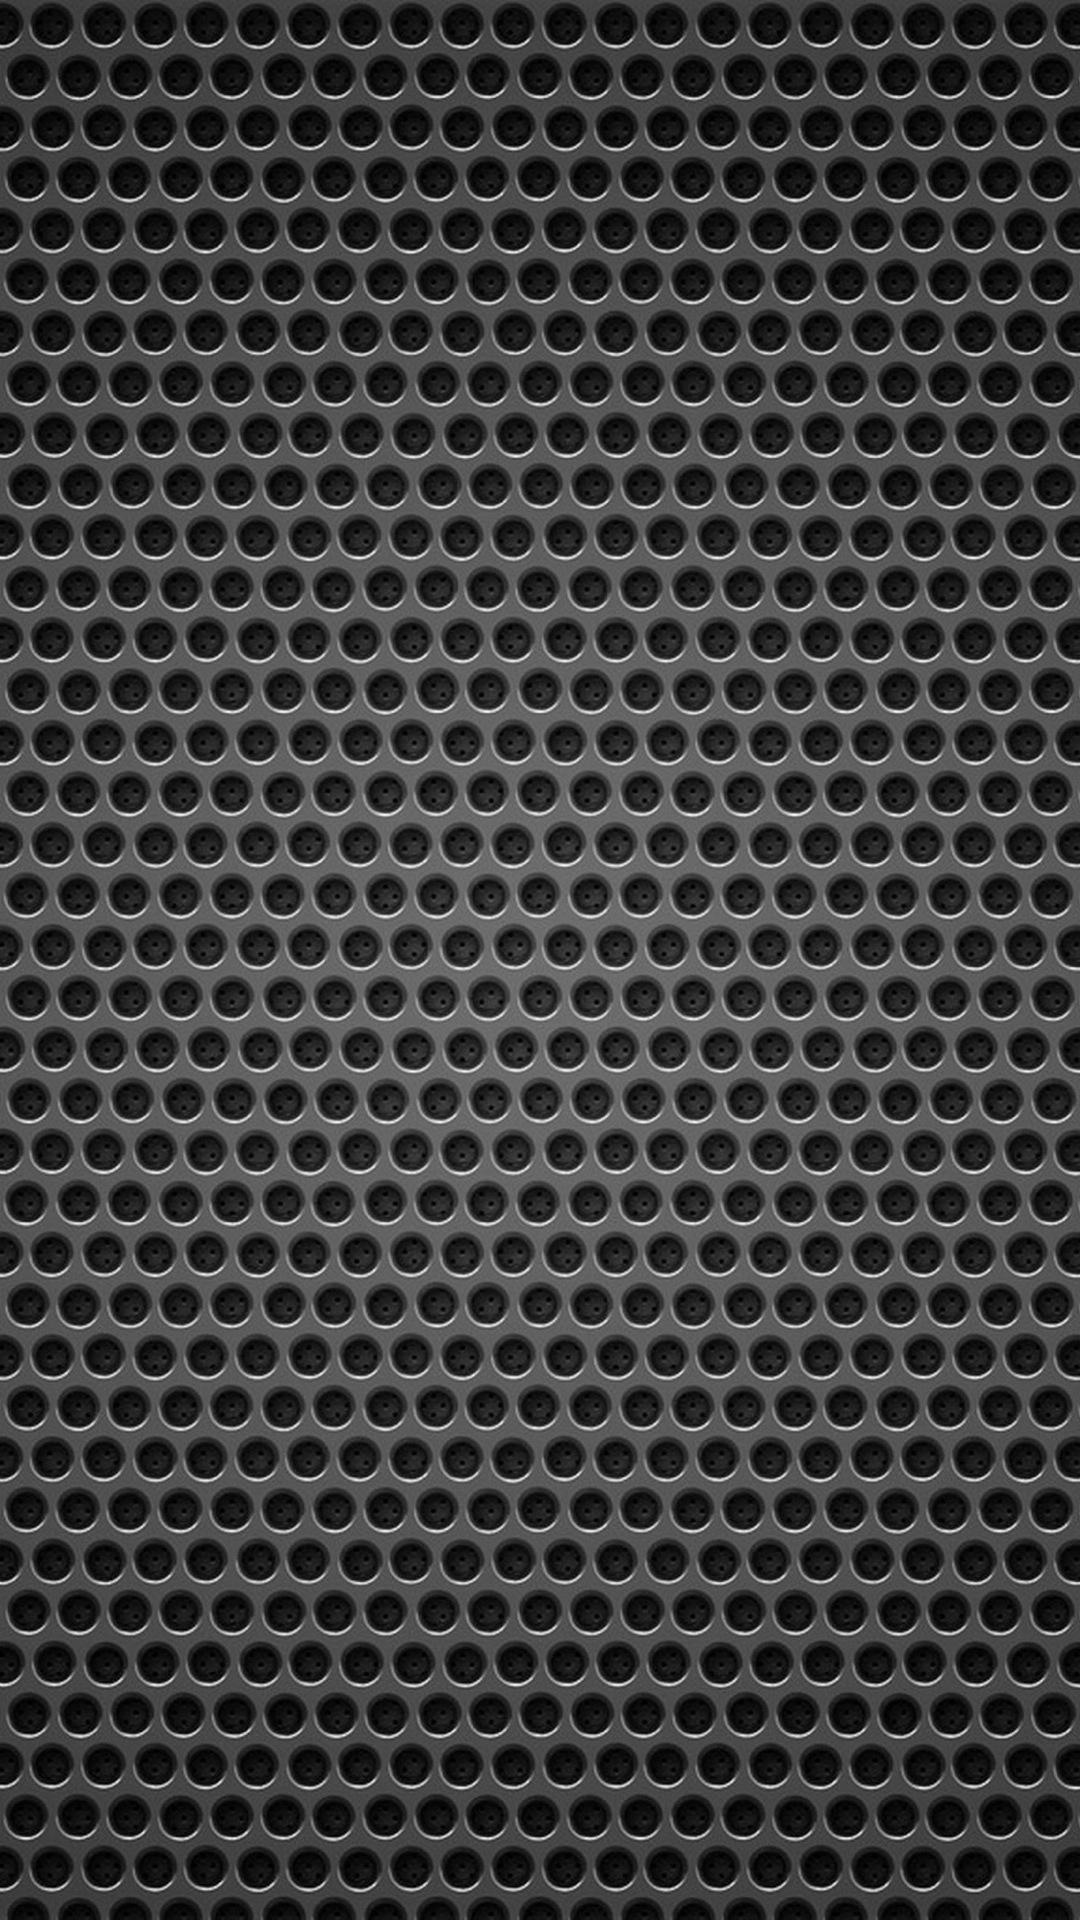 LINE Background Wallpaper 03196のLINE背景画像壁紙